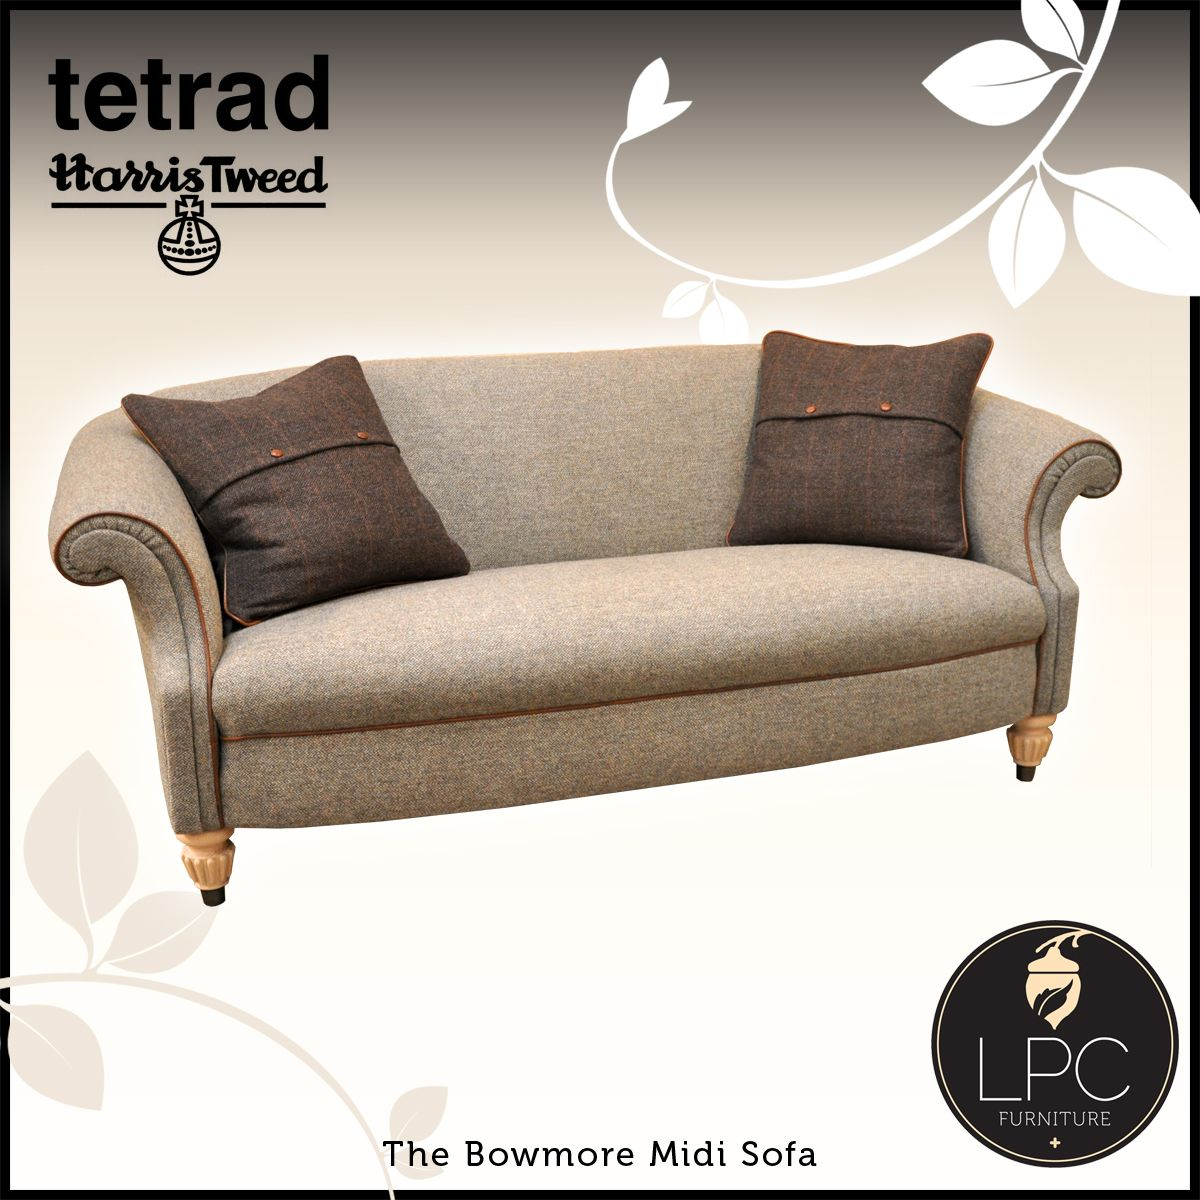 Harris Tweed Bowmore Midi Sofa Large Chaise Sofas Tetrad S Collection Read It